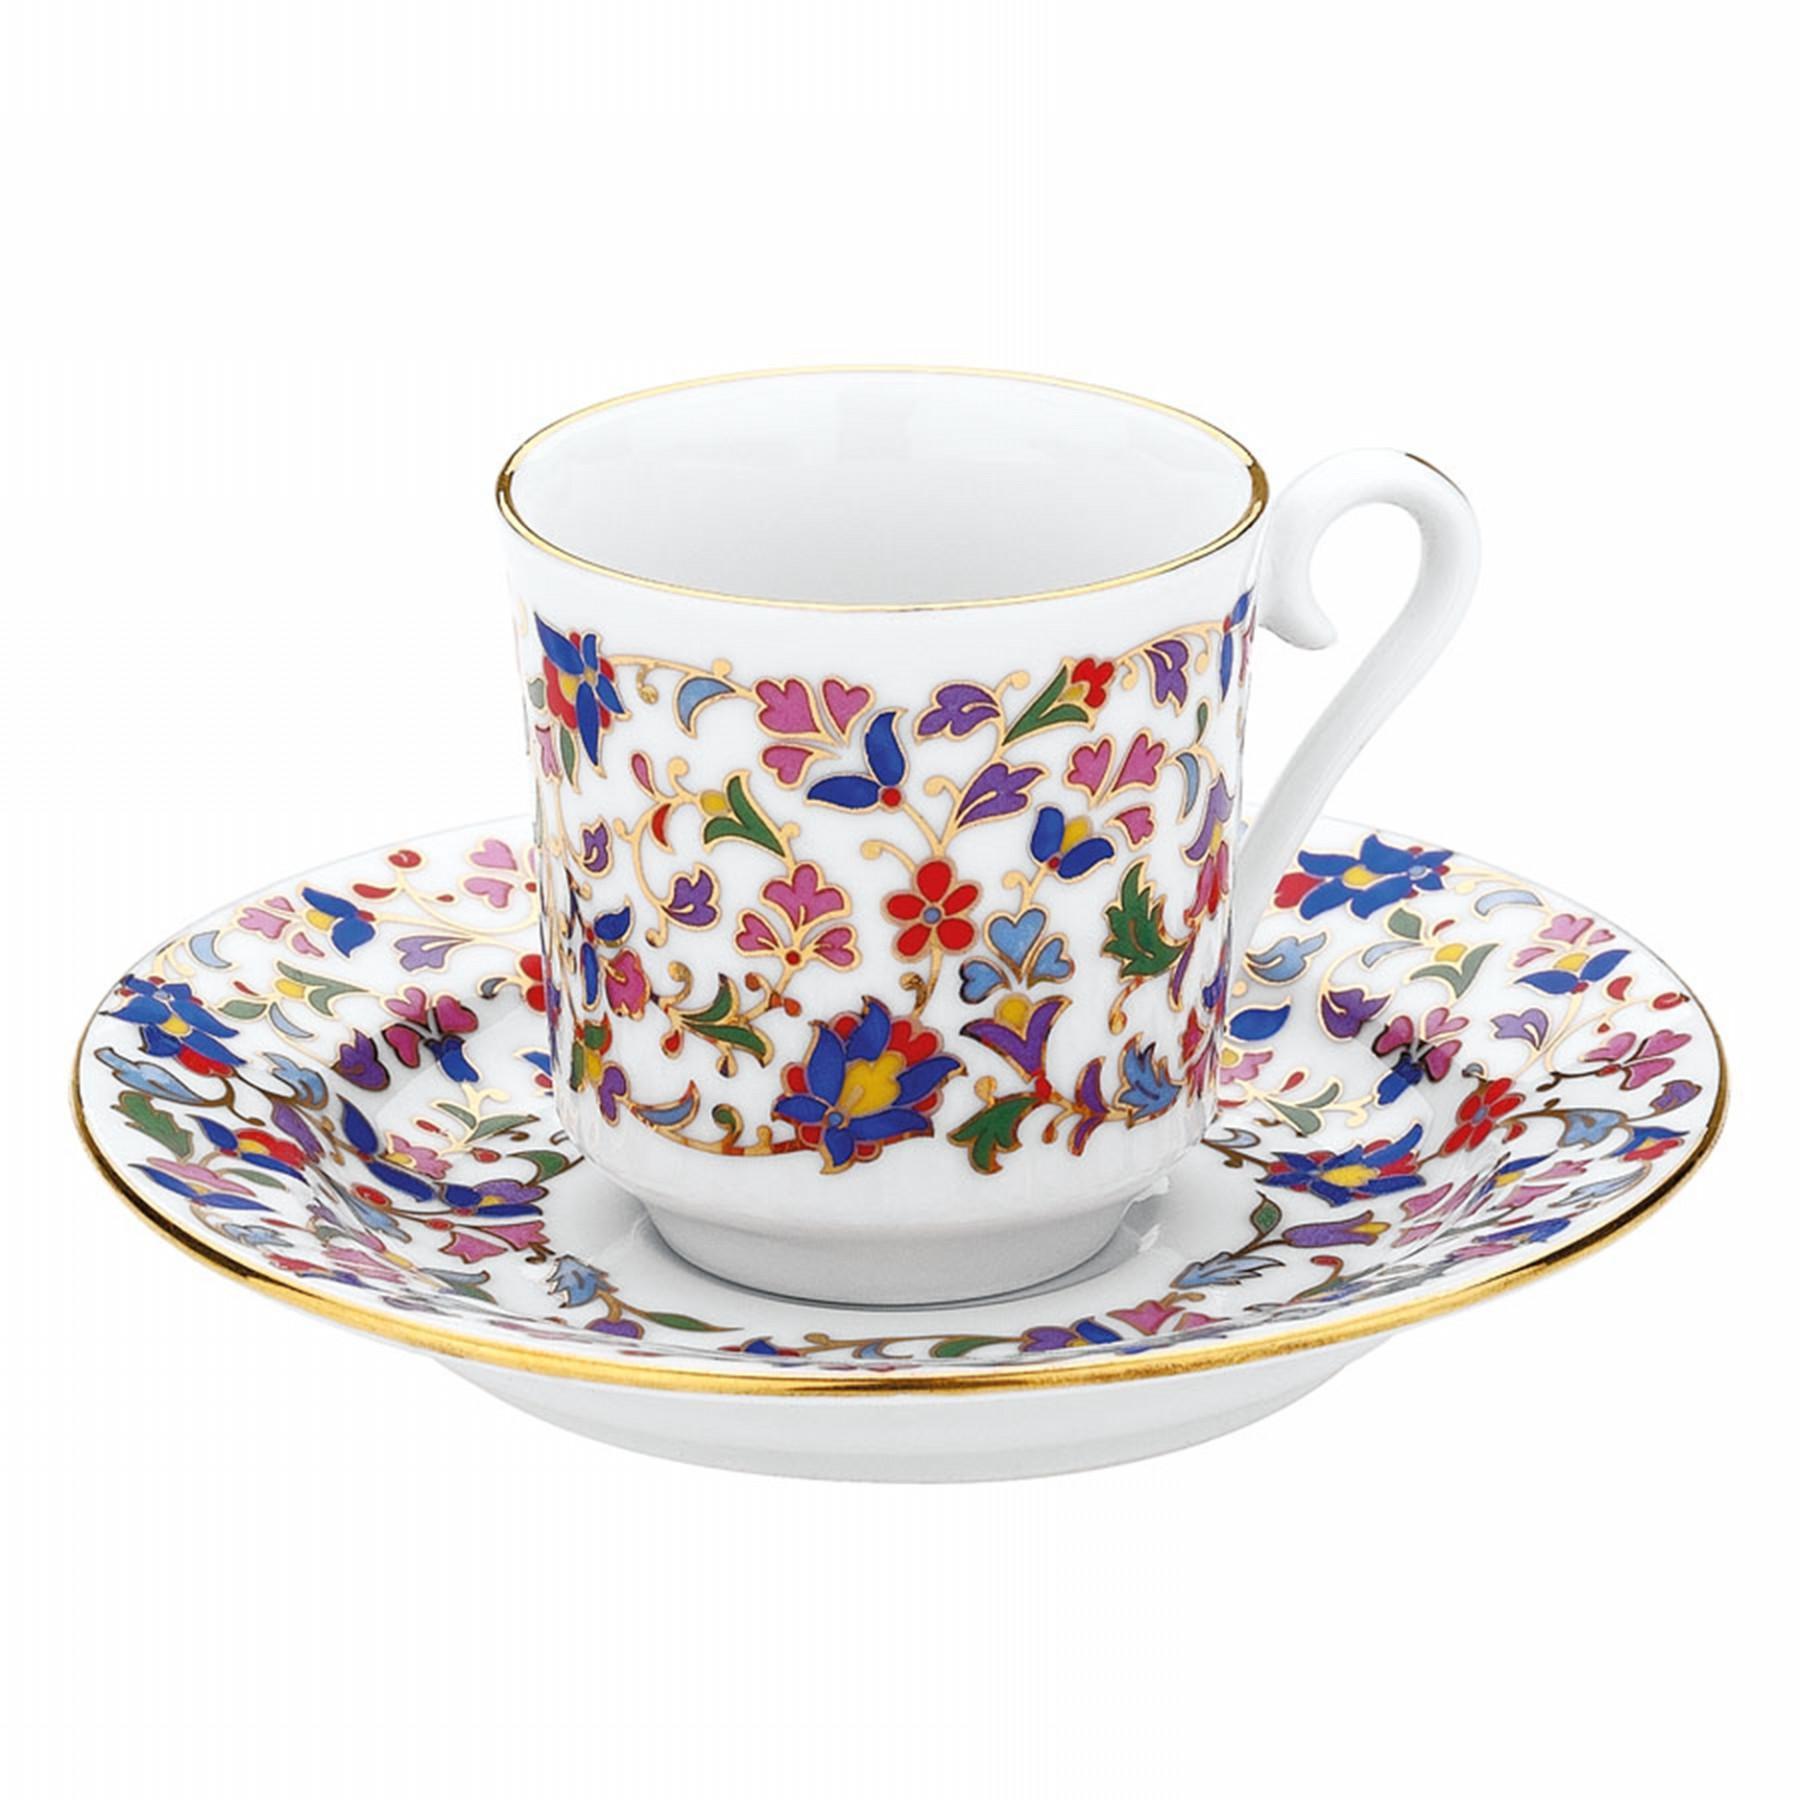 Kutahya Porselen 3645 Handmade Coffee Set for 2 Persons